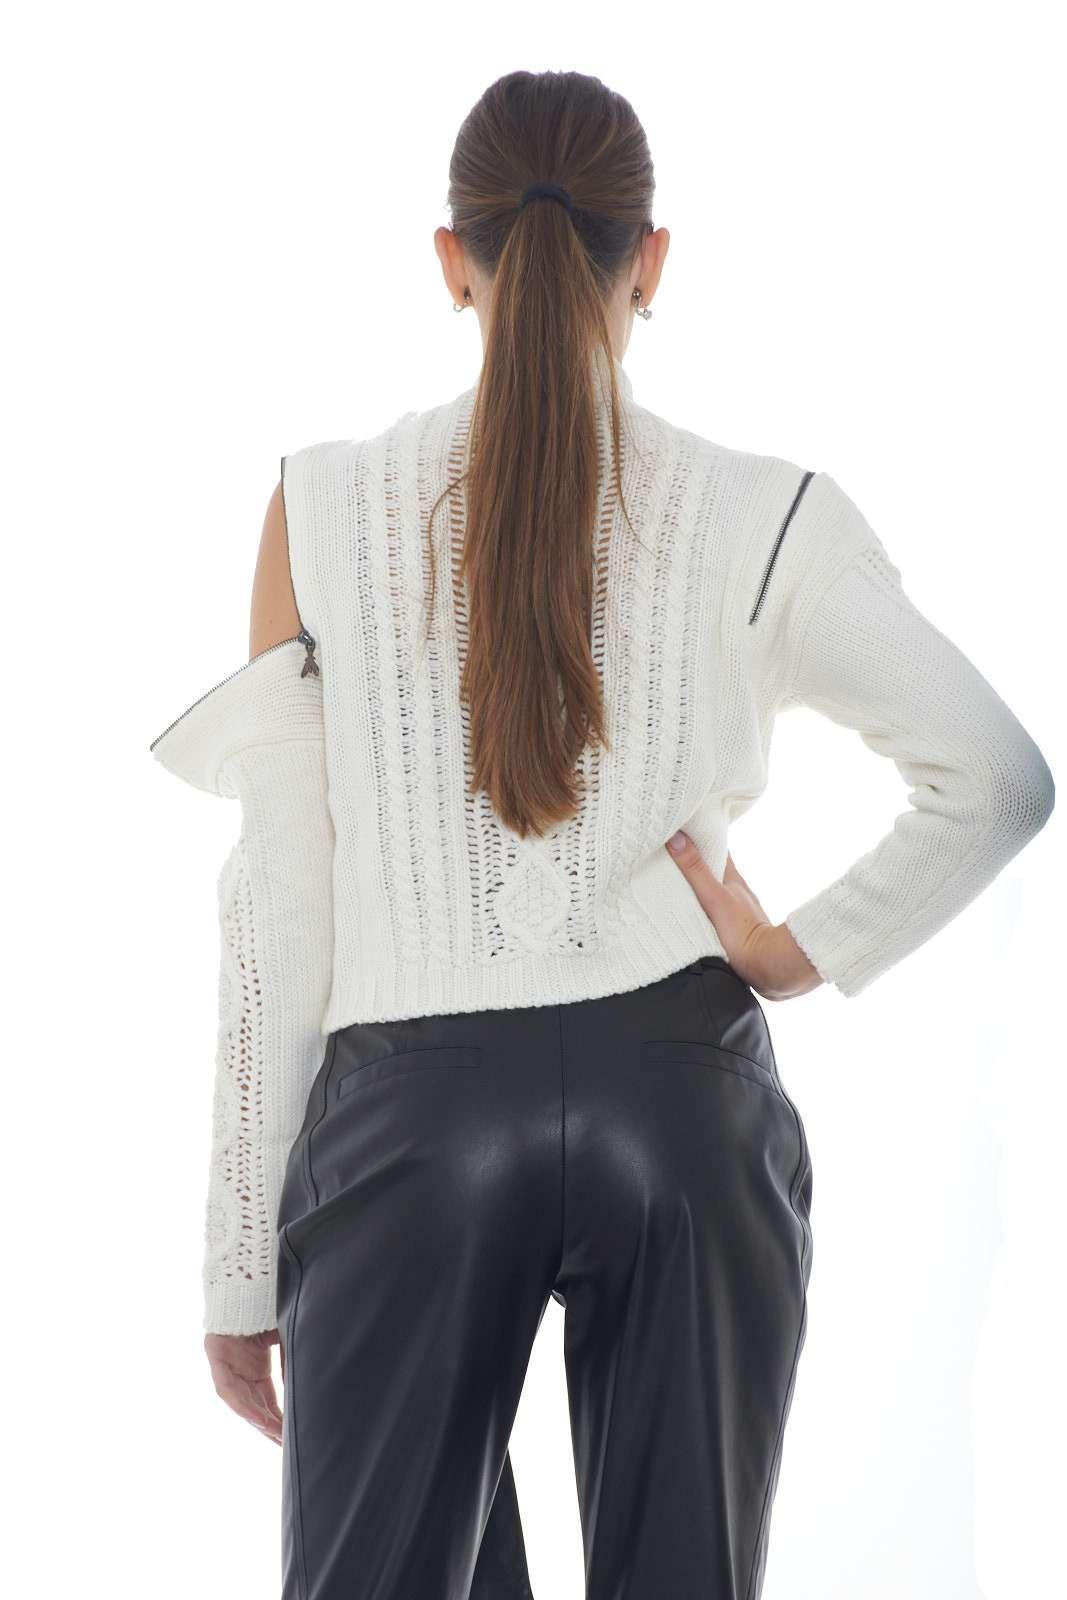 https://www.parmax.com/media/catalog/product/a/i/AI-outlet_parmax-maglia-donna-Patrizia-Pepe-8m0866-C.jpg